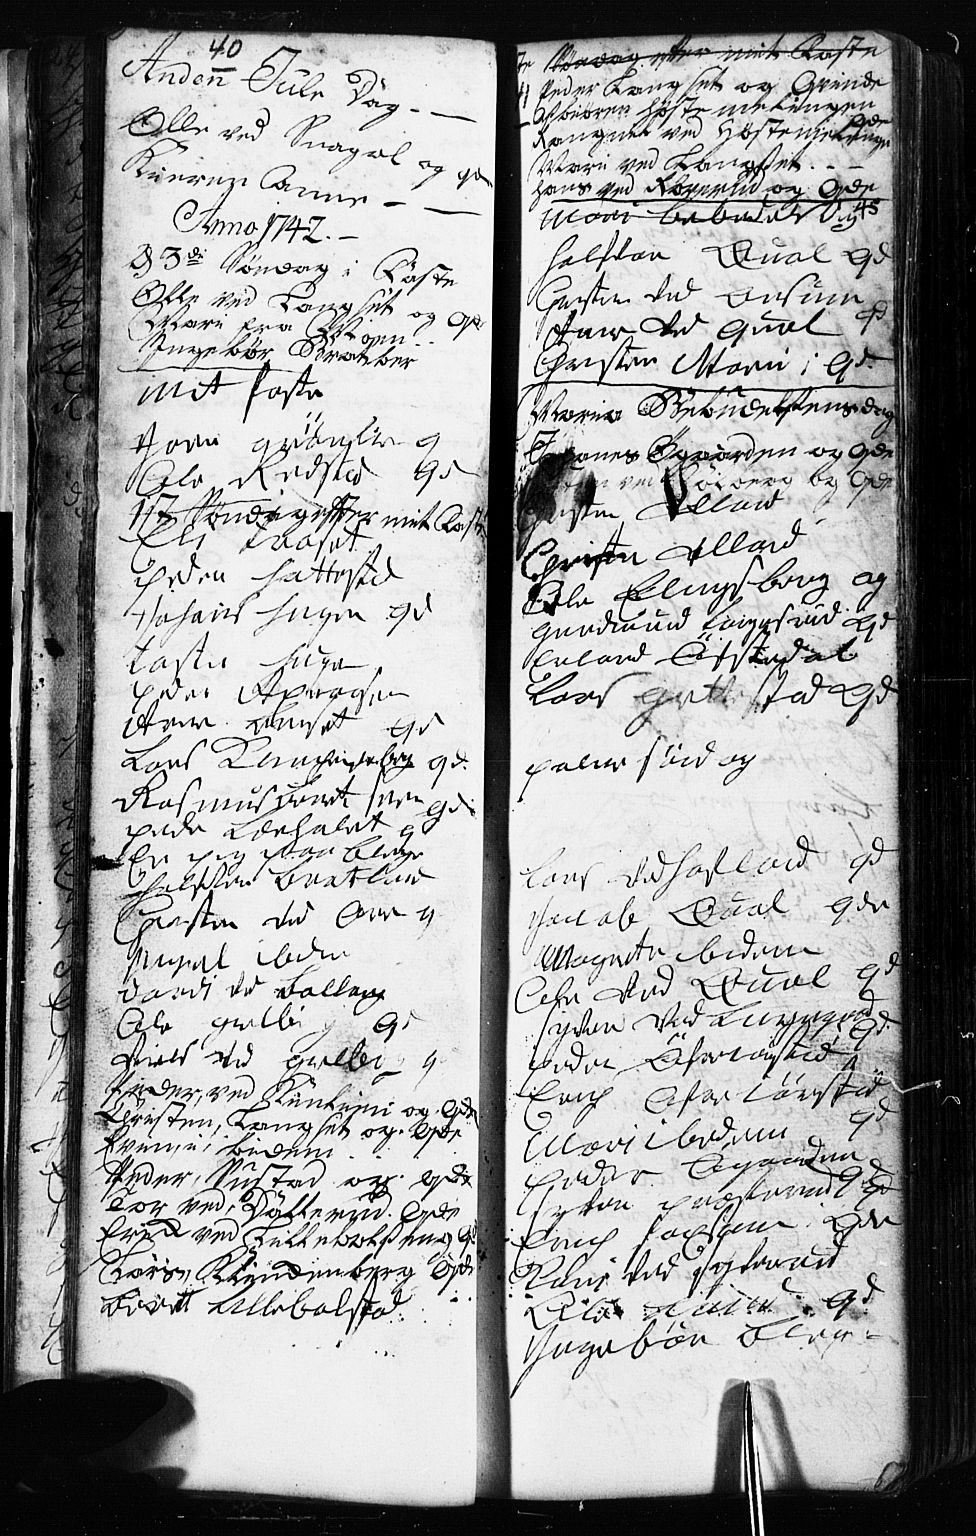 SAH, Fåberg prestekontor, Klokkerbok nr. 2, 1741-1756, s. 40-41